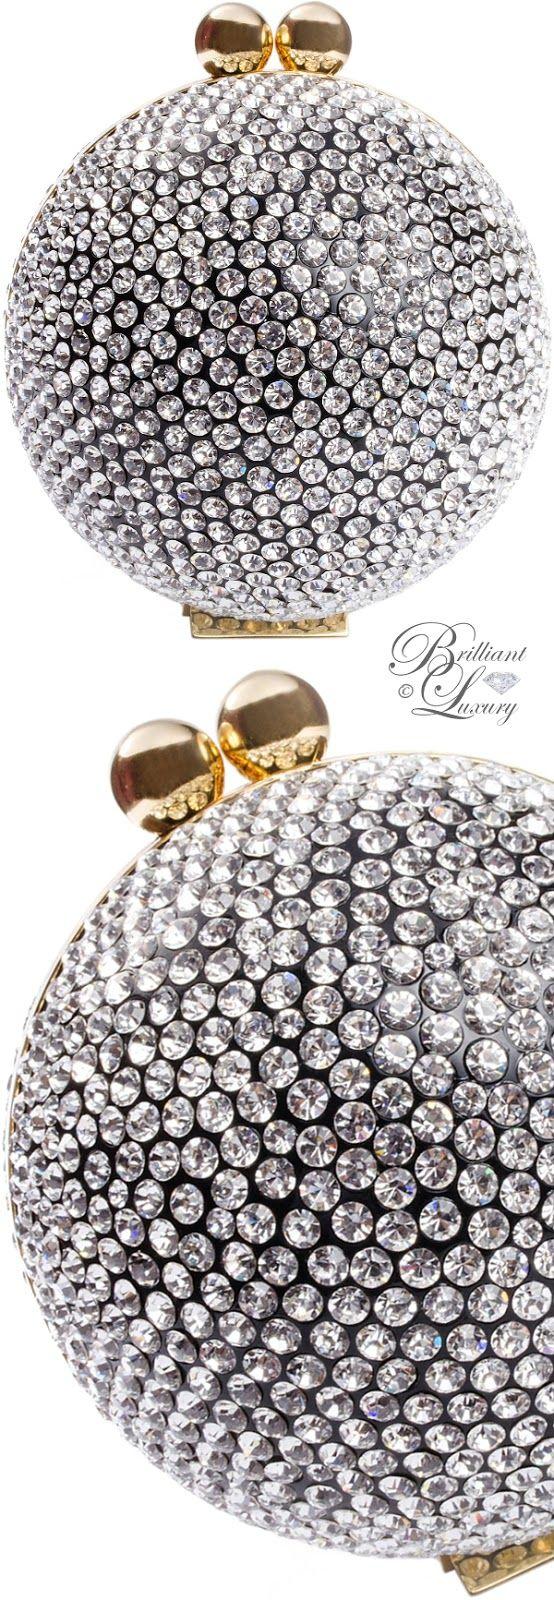 Brilliant Luxury ♦ Marzook crystal orb bag